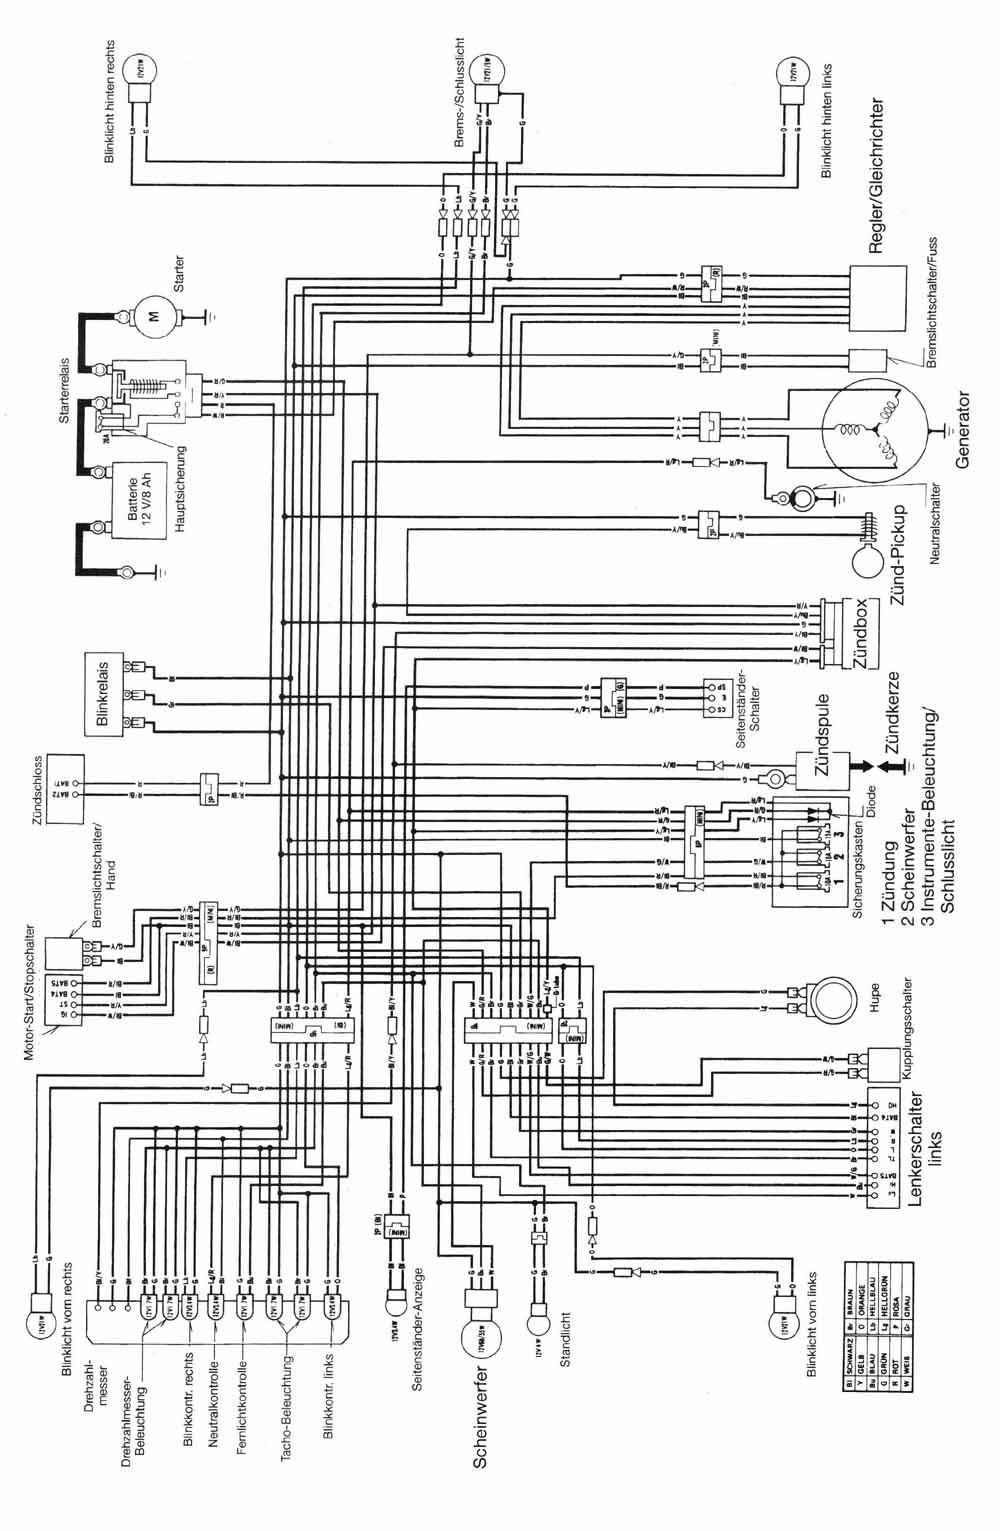 68626d1425930222 electrical nightmare pic_1_2_1 electrical nightmare honda nx 650 wiring diagram at eliteediting.co